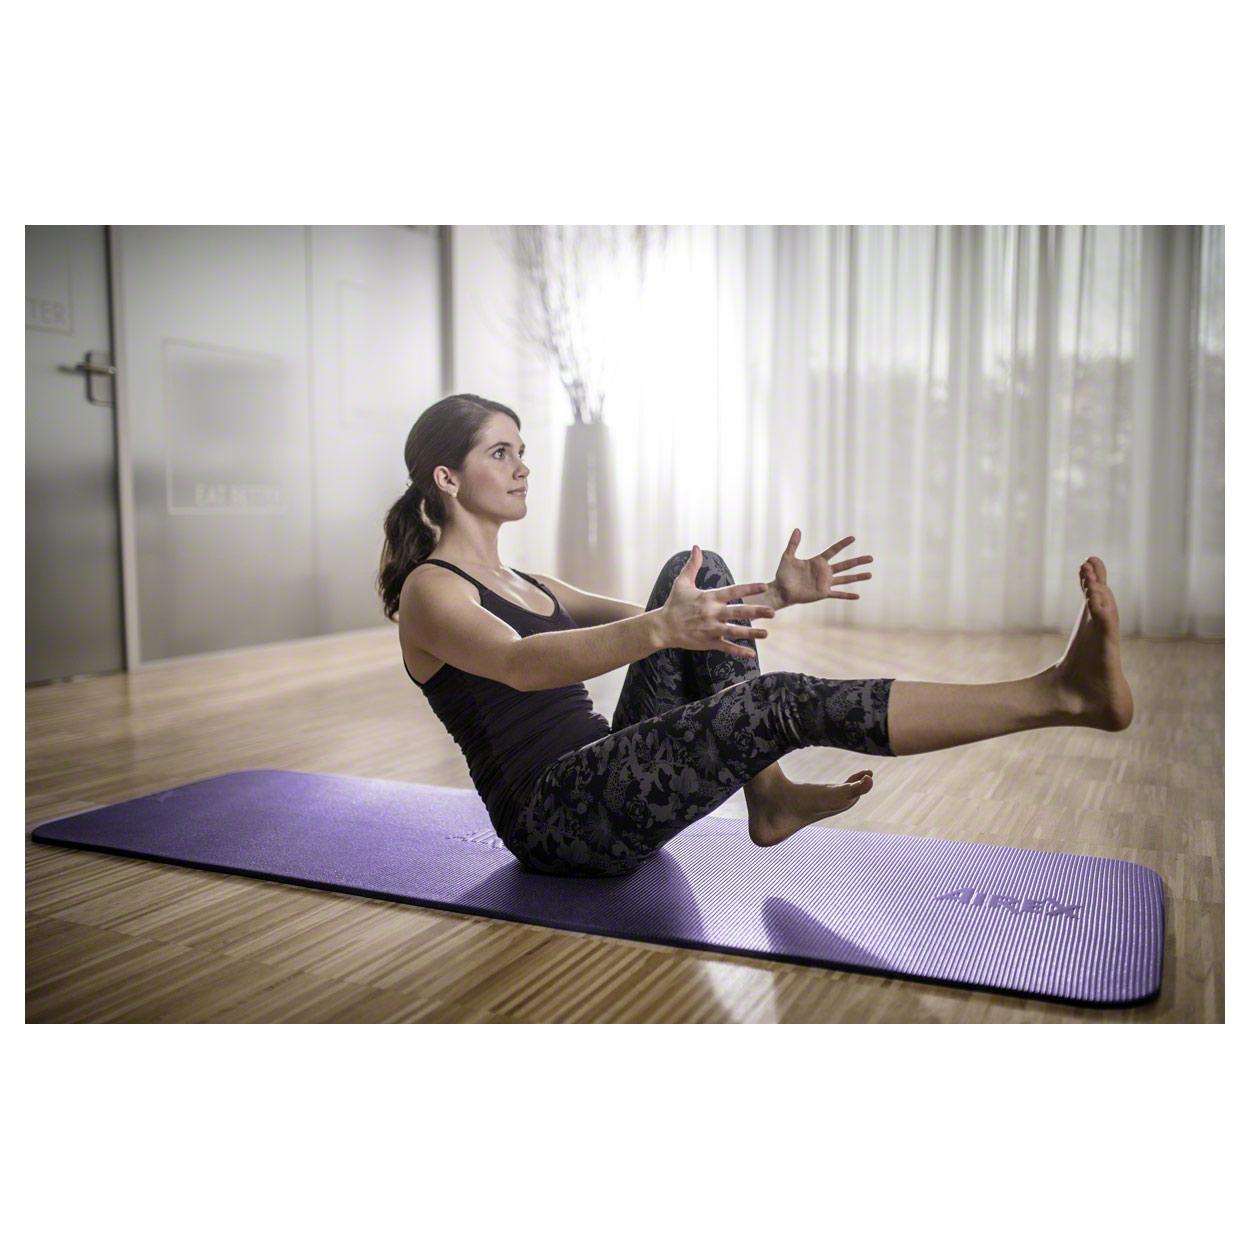 AIREX Pilates & Yogamatte Yogamatte Yogamatte 190 Pilatesmatte Gymnastikmatte Turnmatte Fitnessmatte 0a0ba8